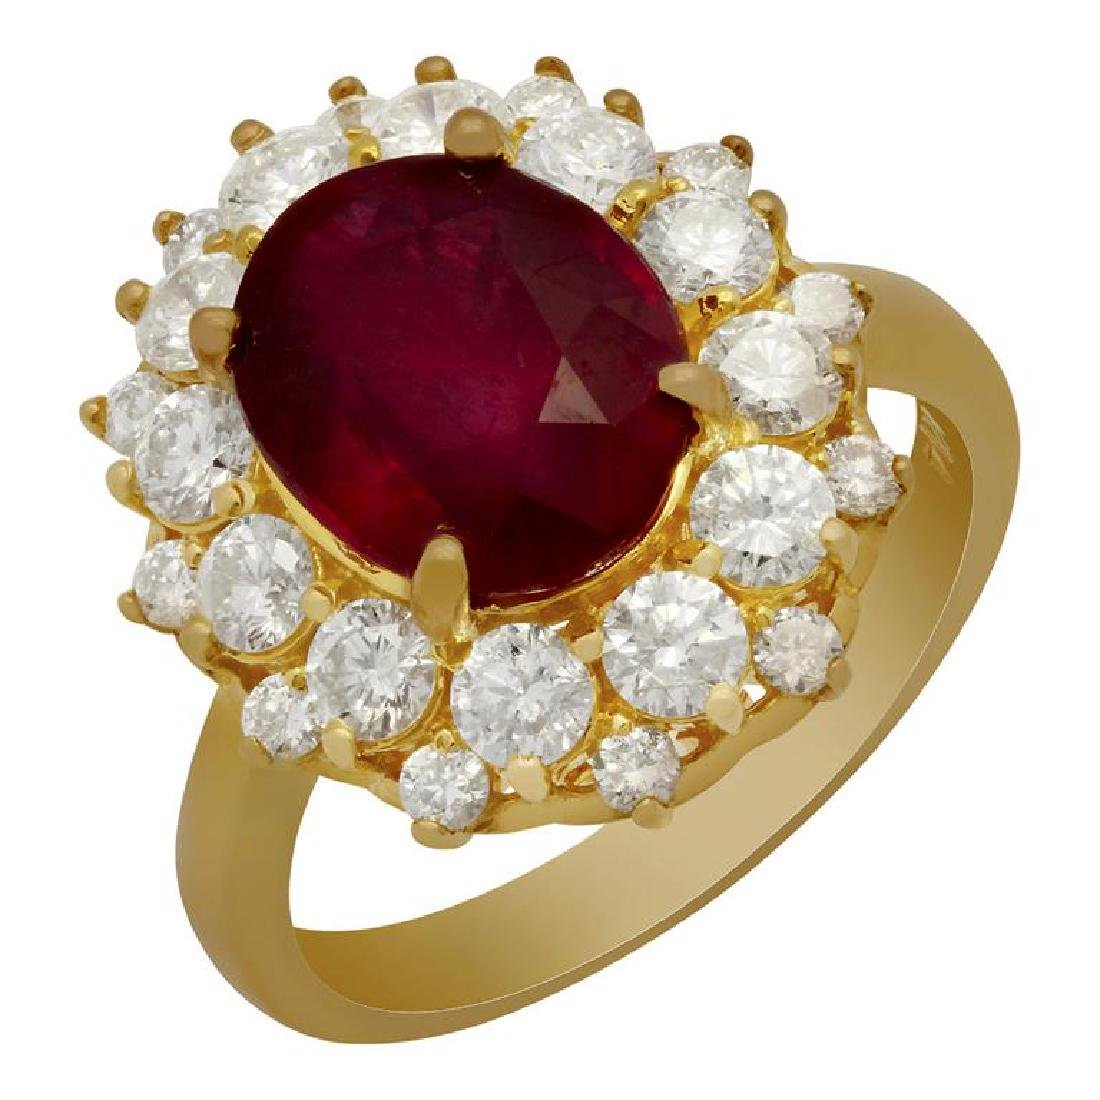 14k Yellow Gold 4.86ct Ruby 1.56ct Diamond Ring